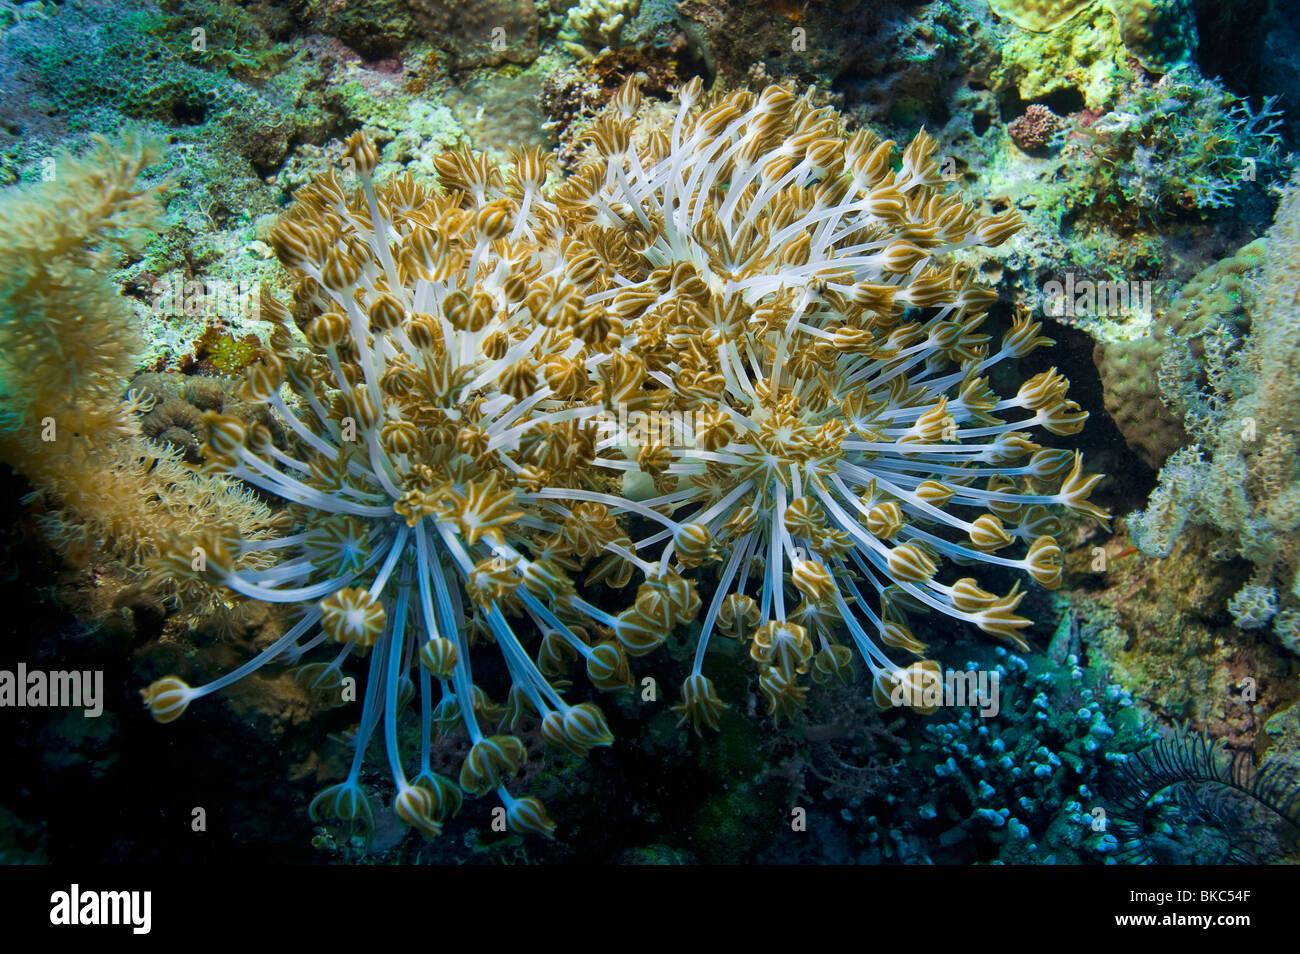 REEF malapascua soft coral sea anemone Corky sea finger Gongonian Briareum asbestinum deadman's fingers flower - Stock Image